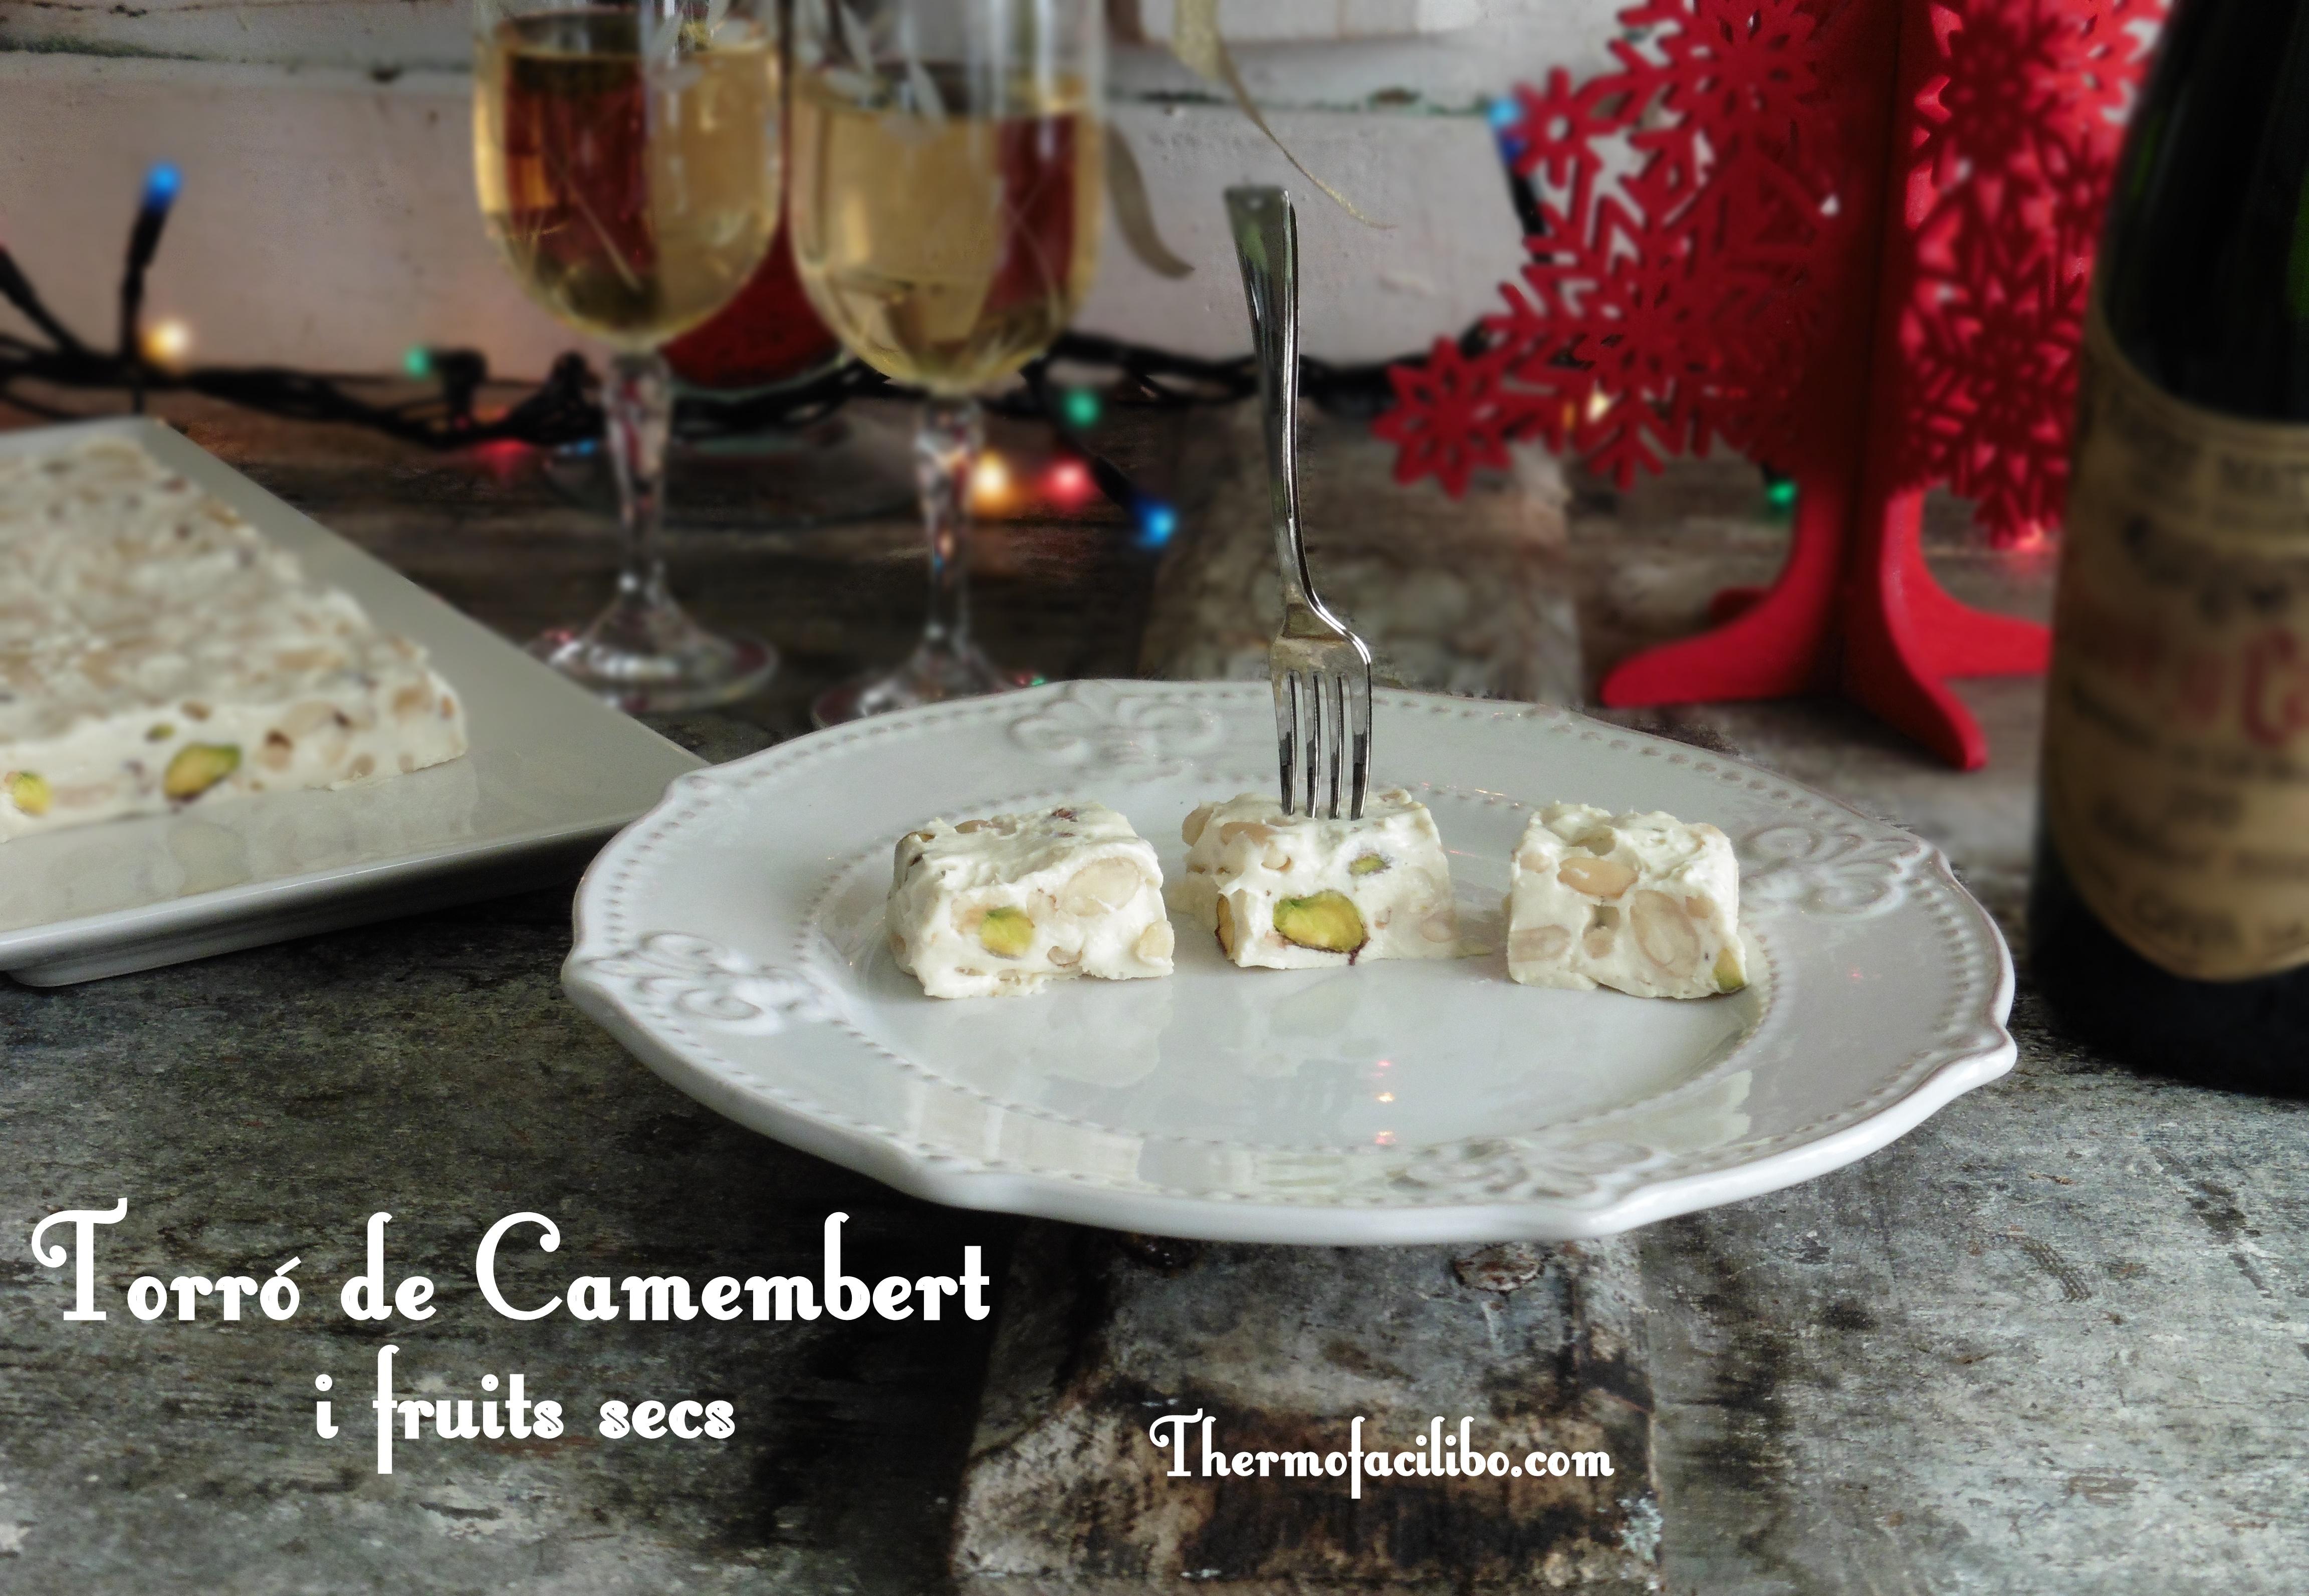 Torró de Camembert